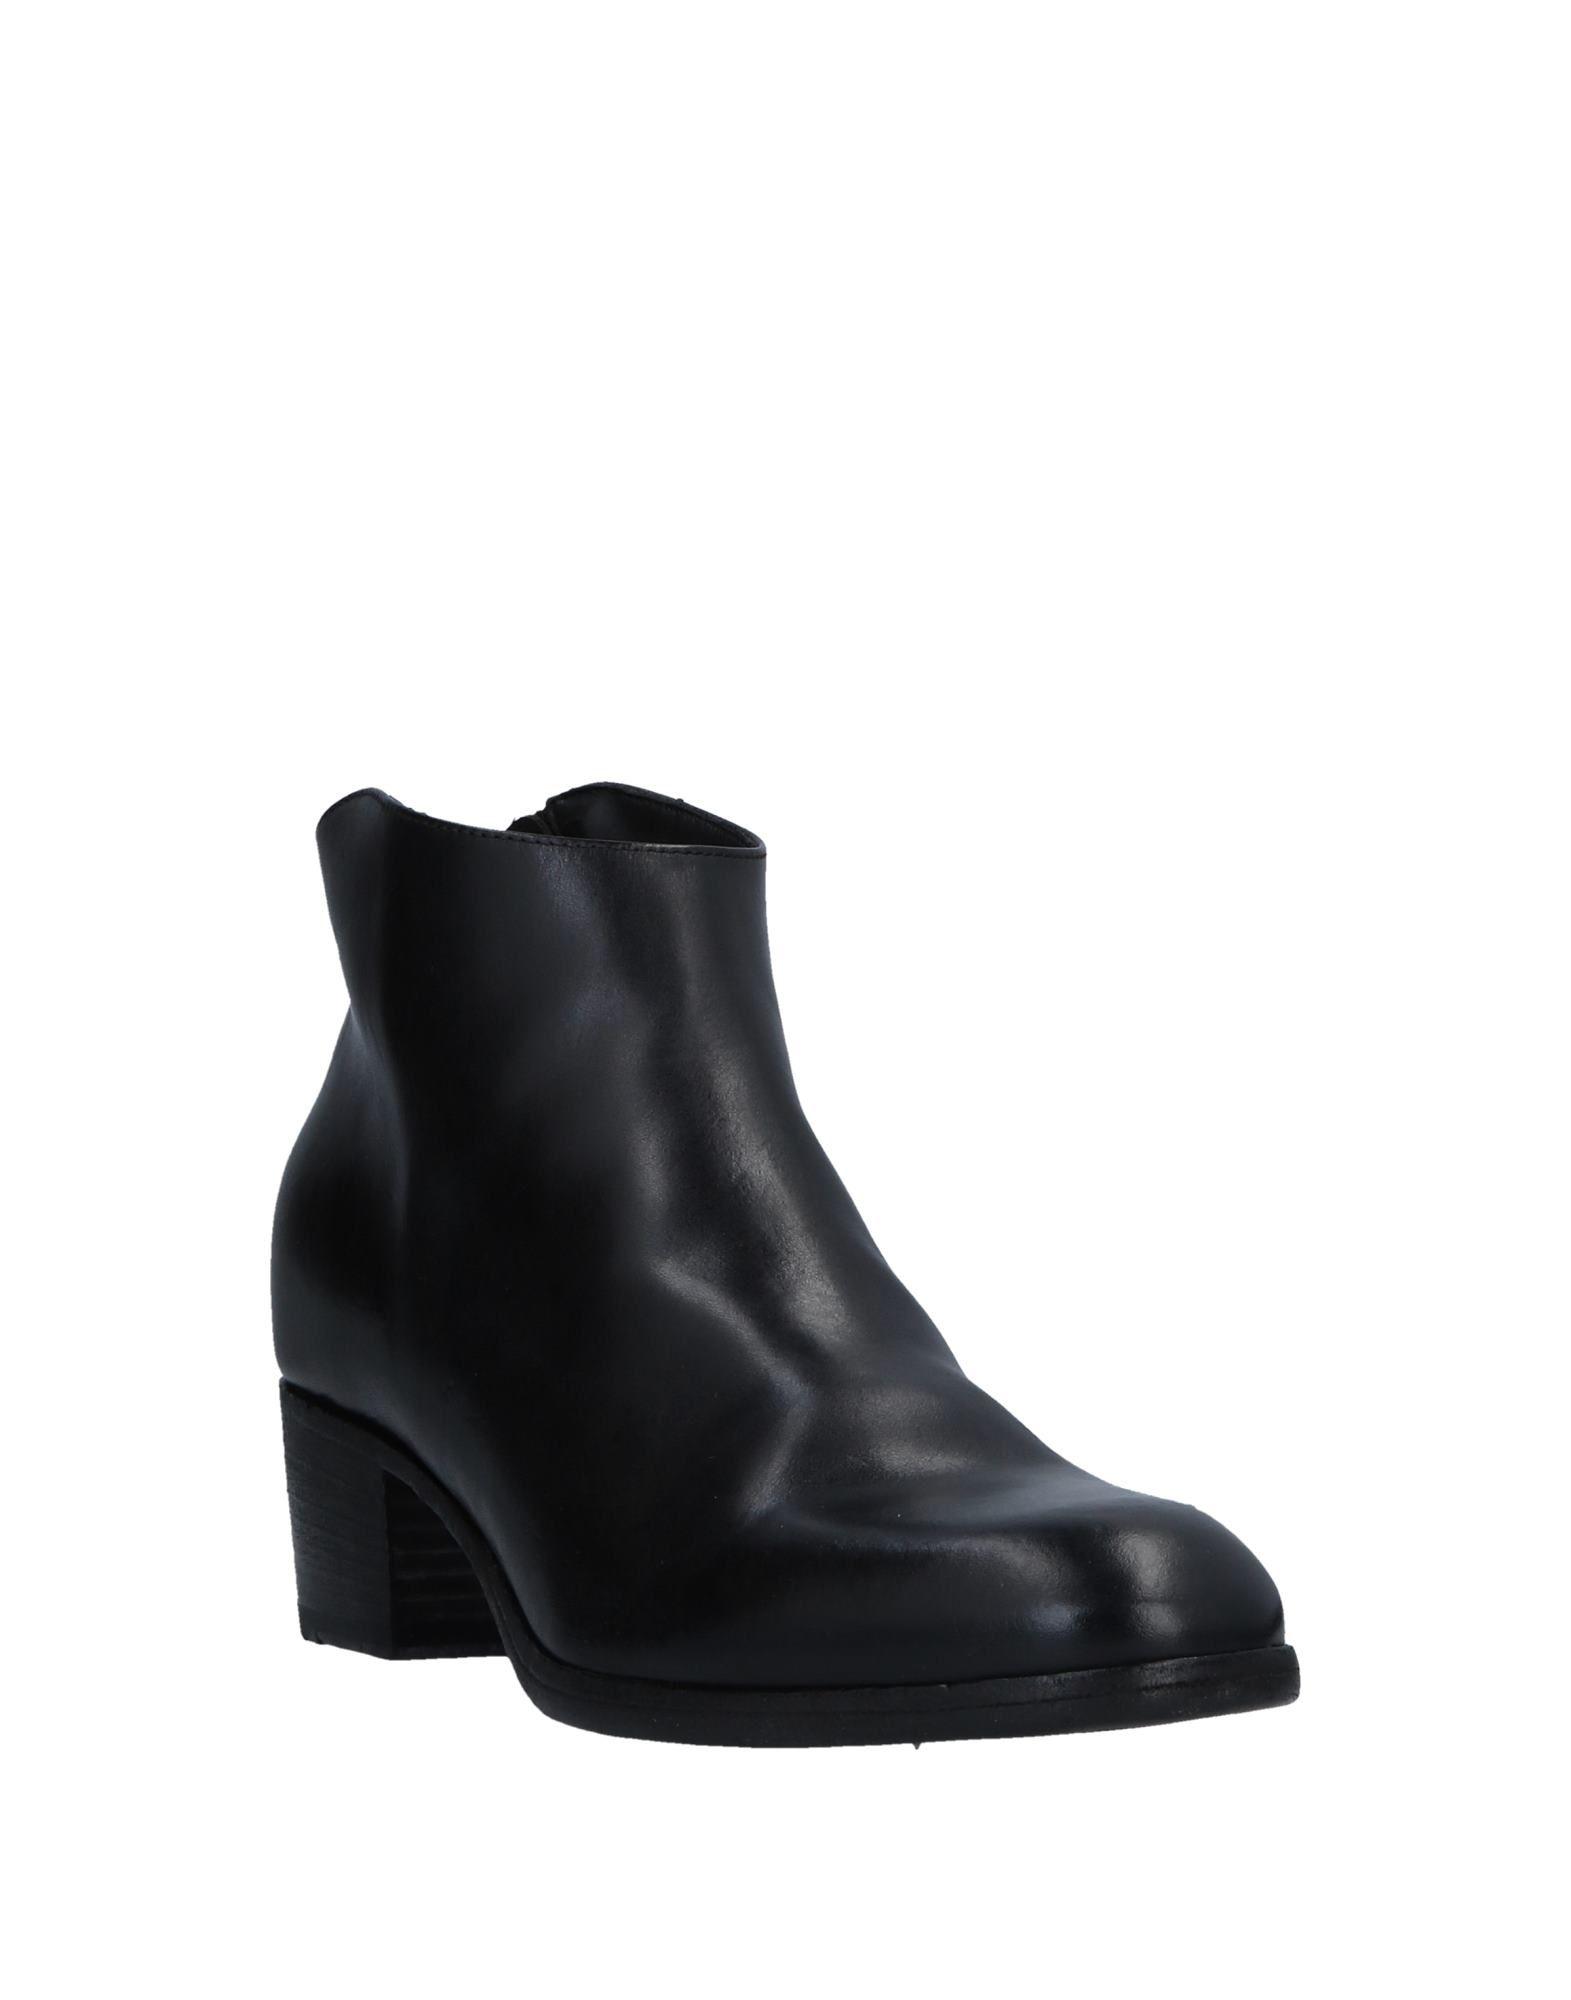 Pantanetti Stiefelette Damen  11513939BLGut Schuhe aussehende strapazierfähige Schuhe 11513939BLGut 5a978f